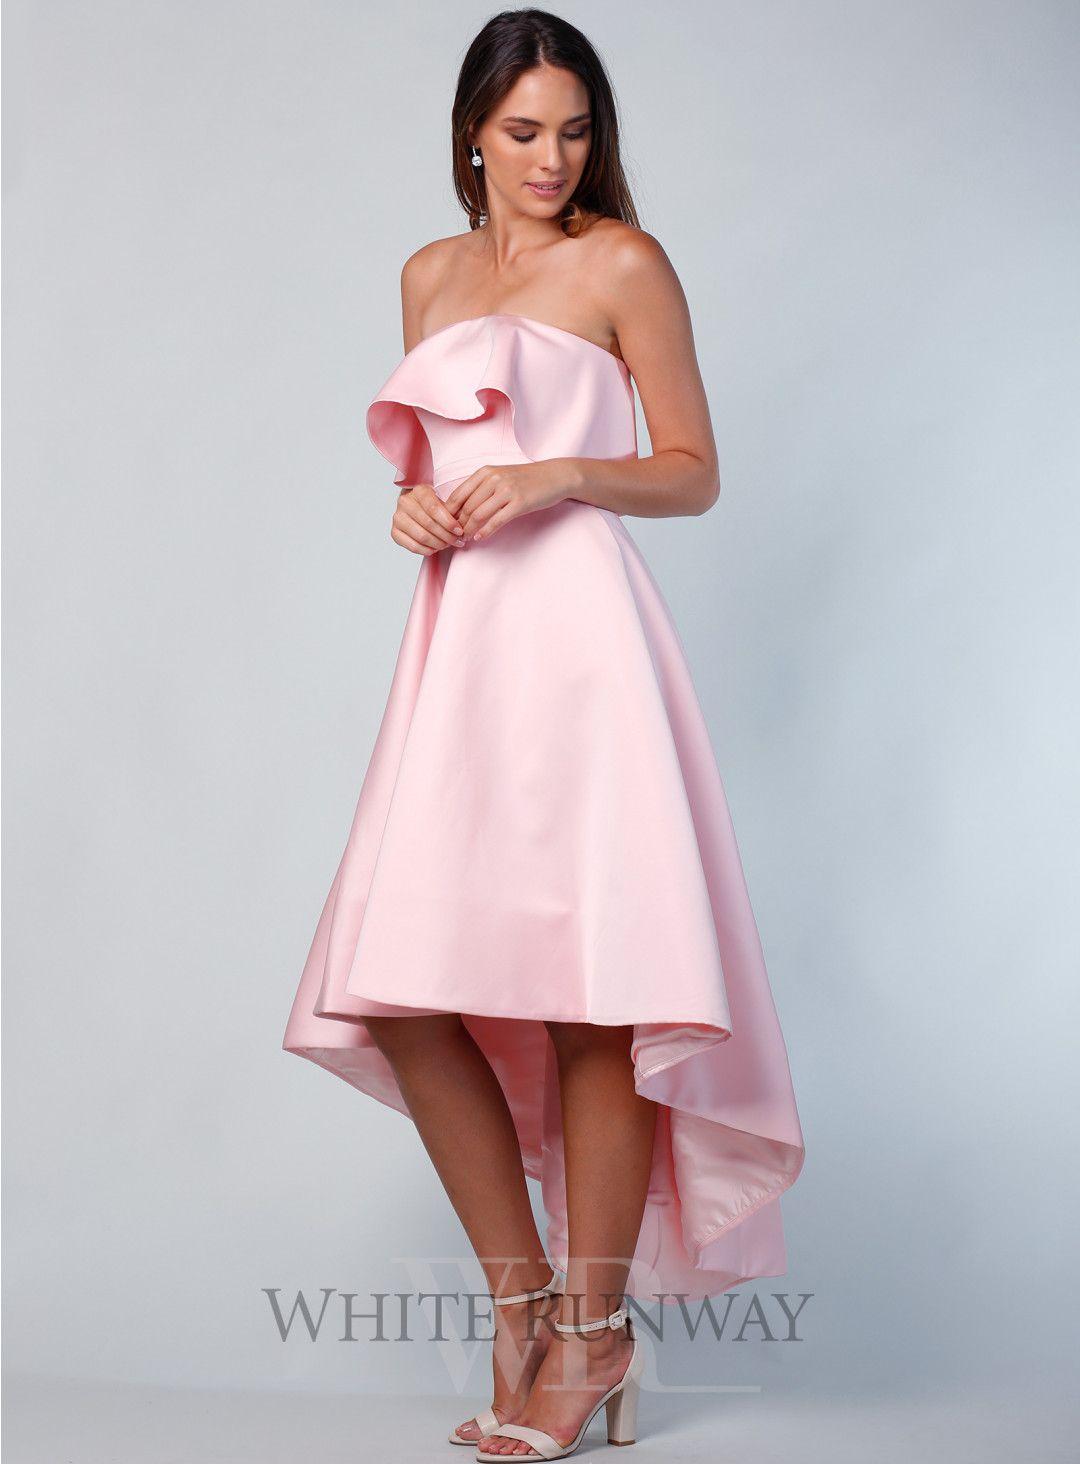 Pastel pink bridesmaid dress  Coco Asymmetric Dress  wedding  Pinterest  Weddingideas Chic